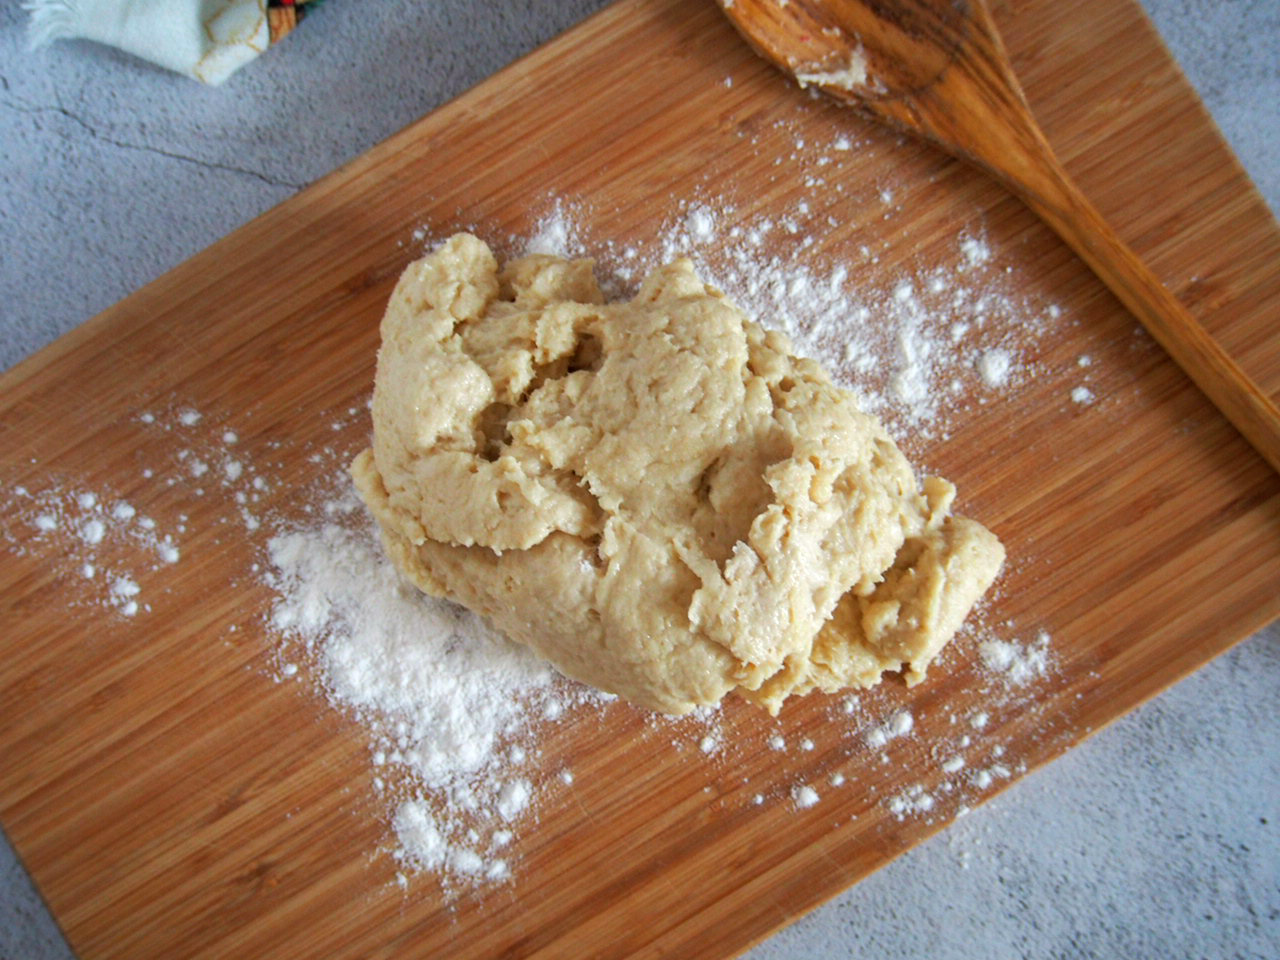 Sugar Buns dough ready for kneading.